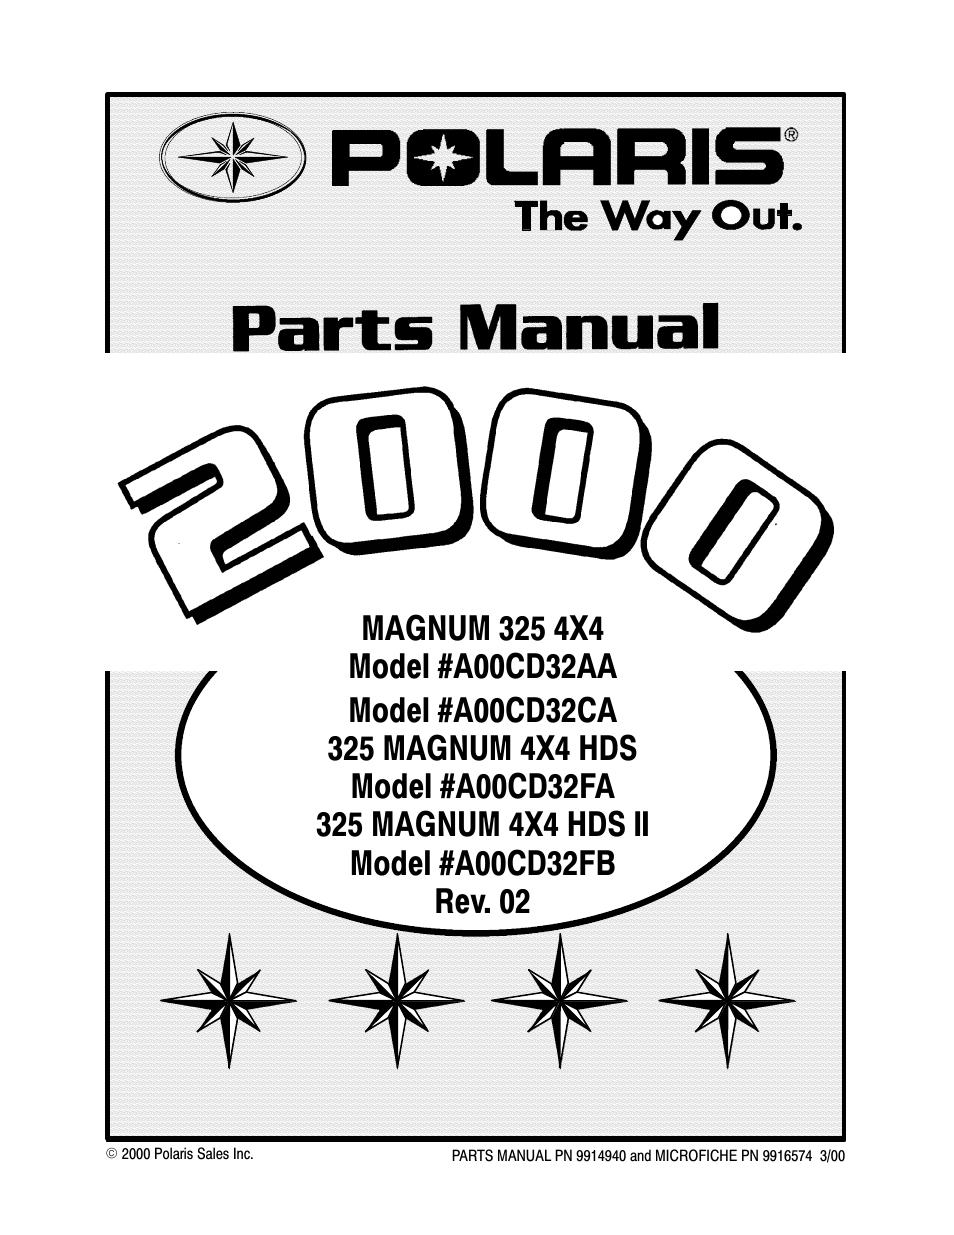 2000 Polaris Magnum 325 4x4 Wiring Diagram Electrical Diagrams 330 Manual Pdf Data U2022 Trail Boss